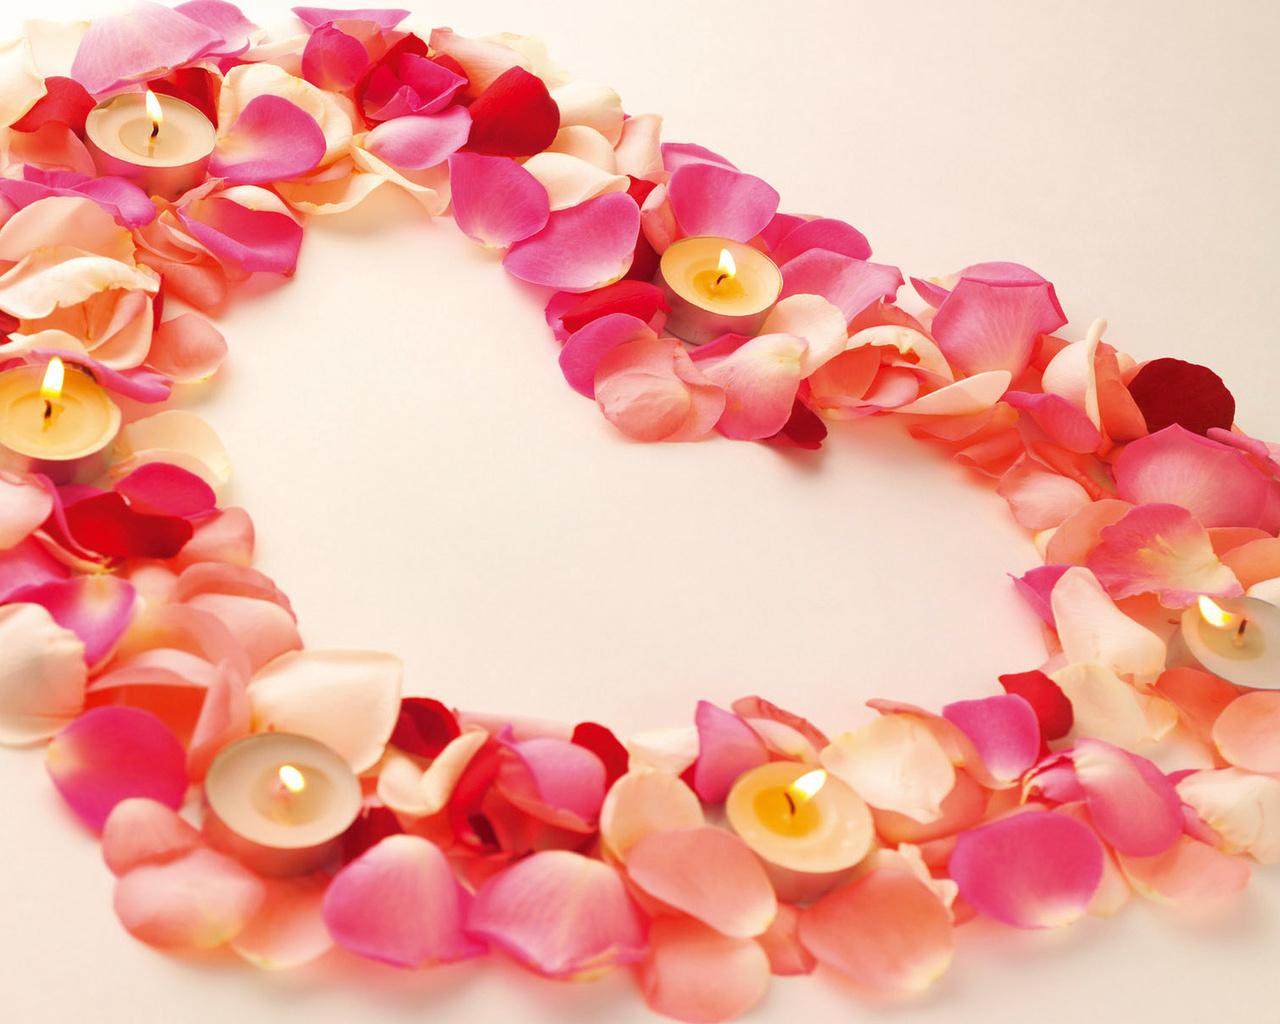 http://4.bp.blogspot.com/-OQ2GGv5VW6A/TzFrLLuG91I/AAAAAAAABmM/Q6ecSUsWQ9g/s1600/valentines-day-greeting-cards.jpg